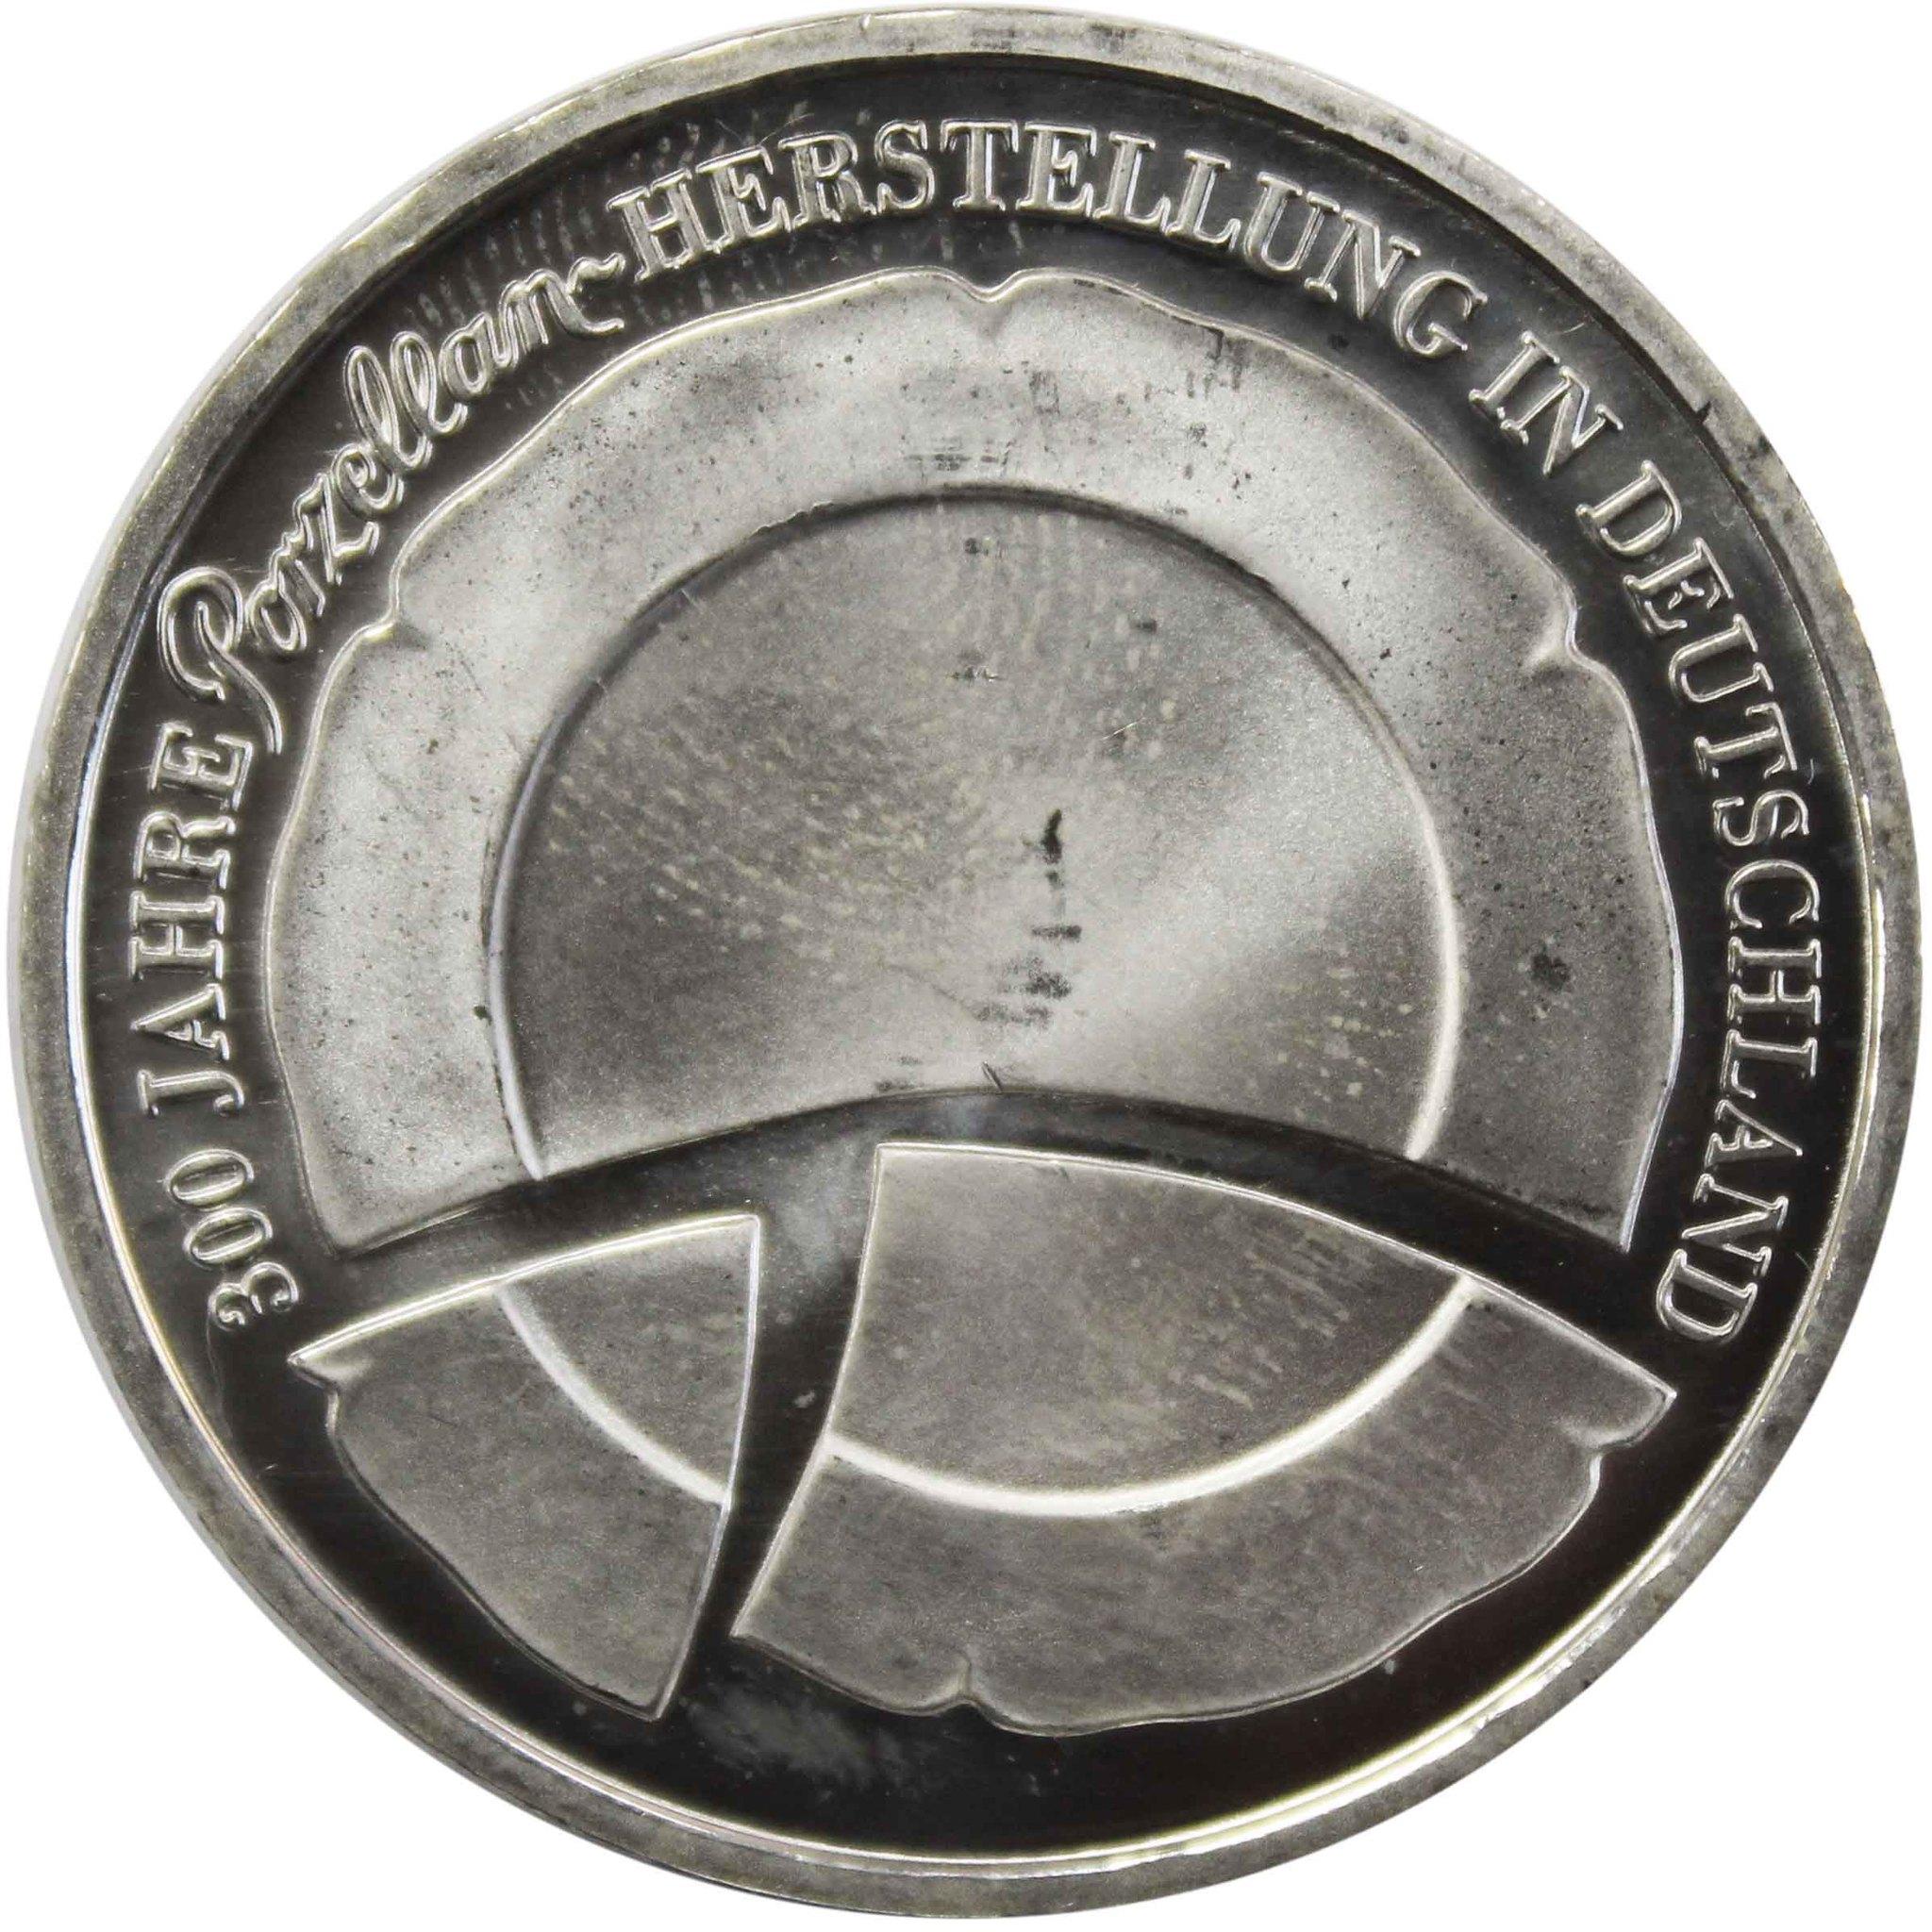 10 евро. 300 лет немецкому фарфору. Германия. 2010 год. Серебро